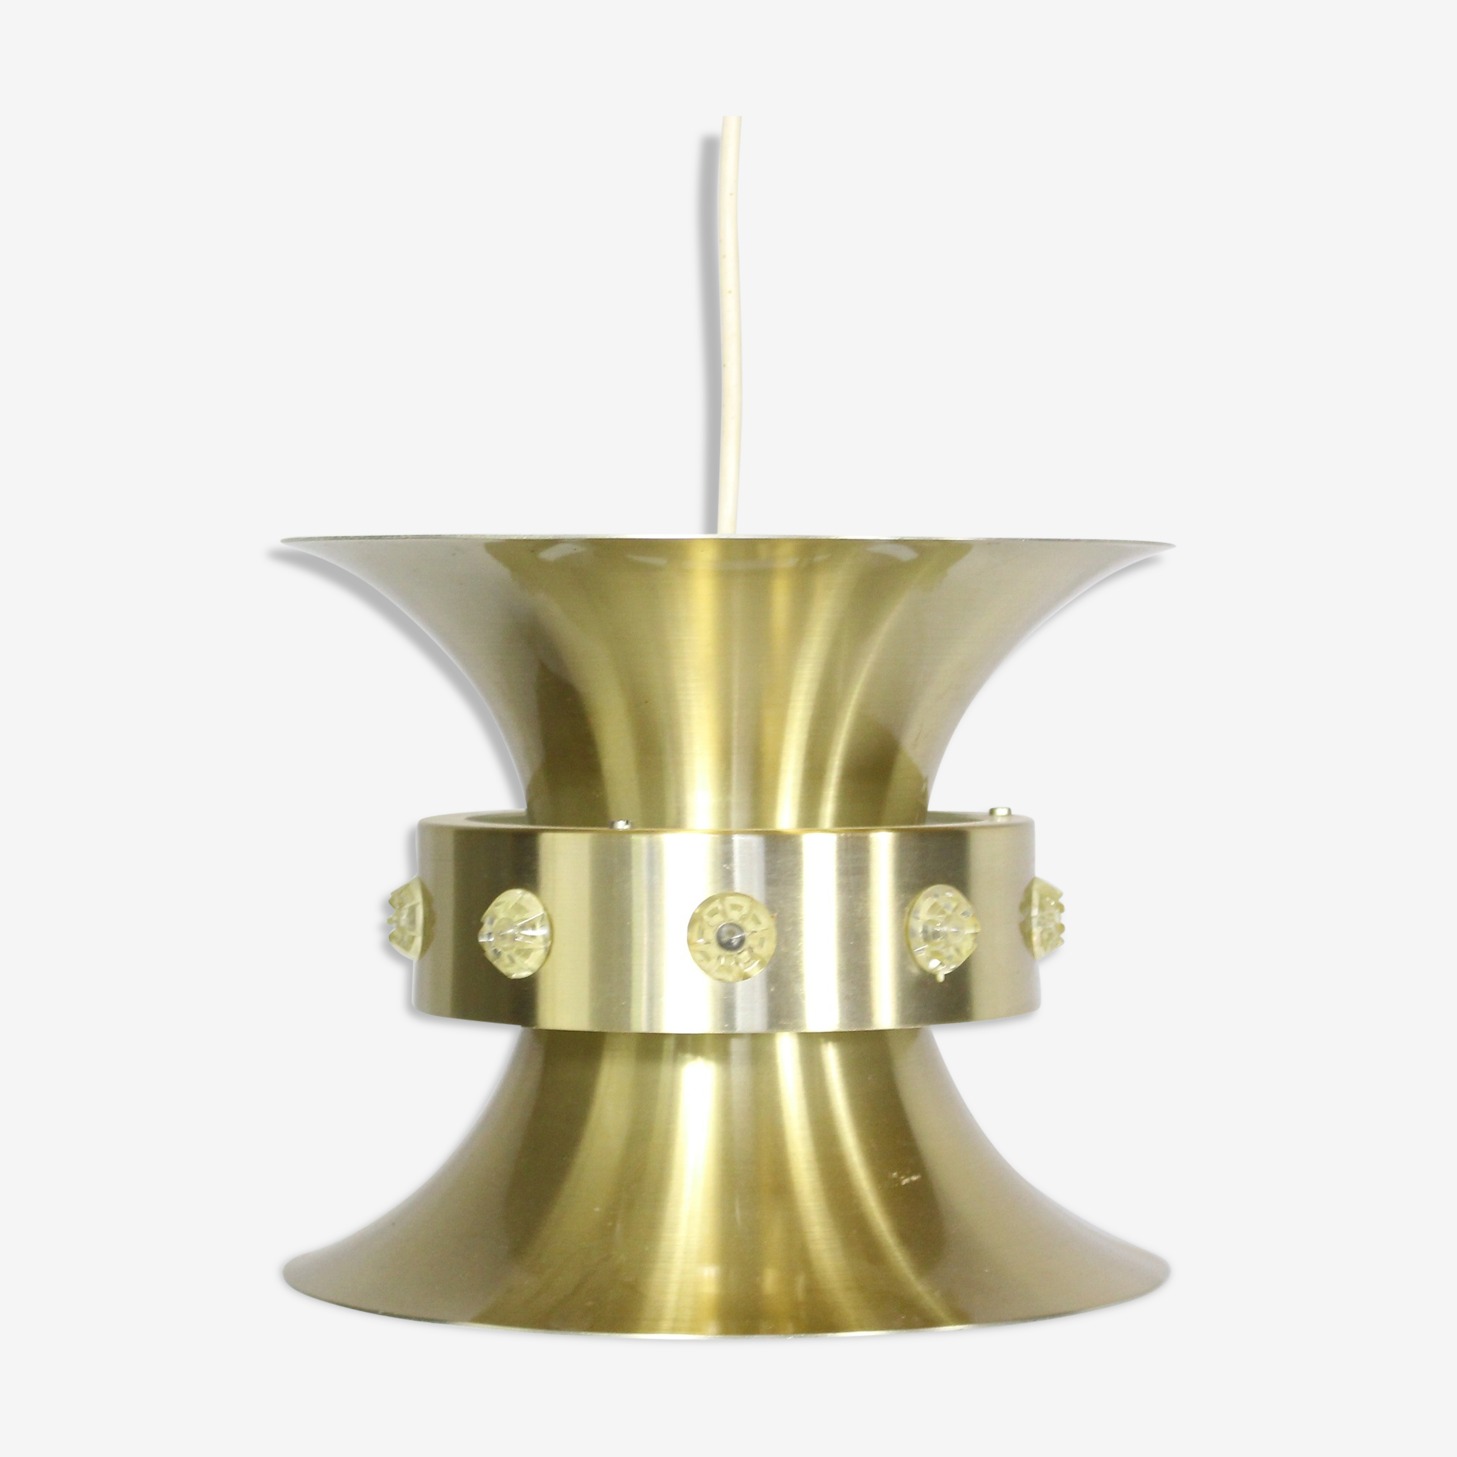 Scandinavian hanging lamp by Carl Thore, 1960